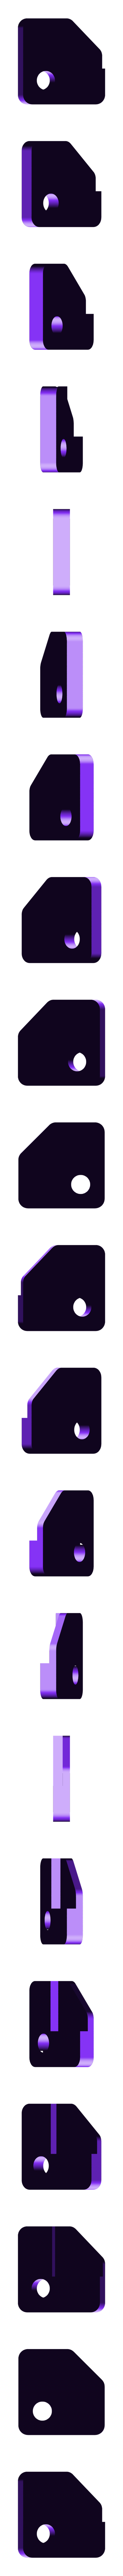 window_bracket_corner.stl Download free STL file Portable 3D Printer • 3D printable design, Job